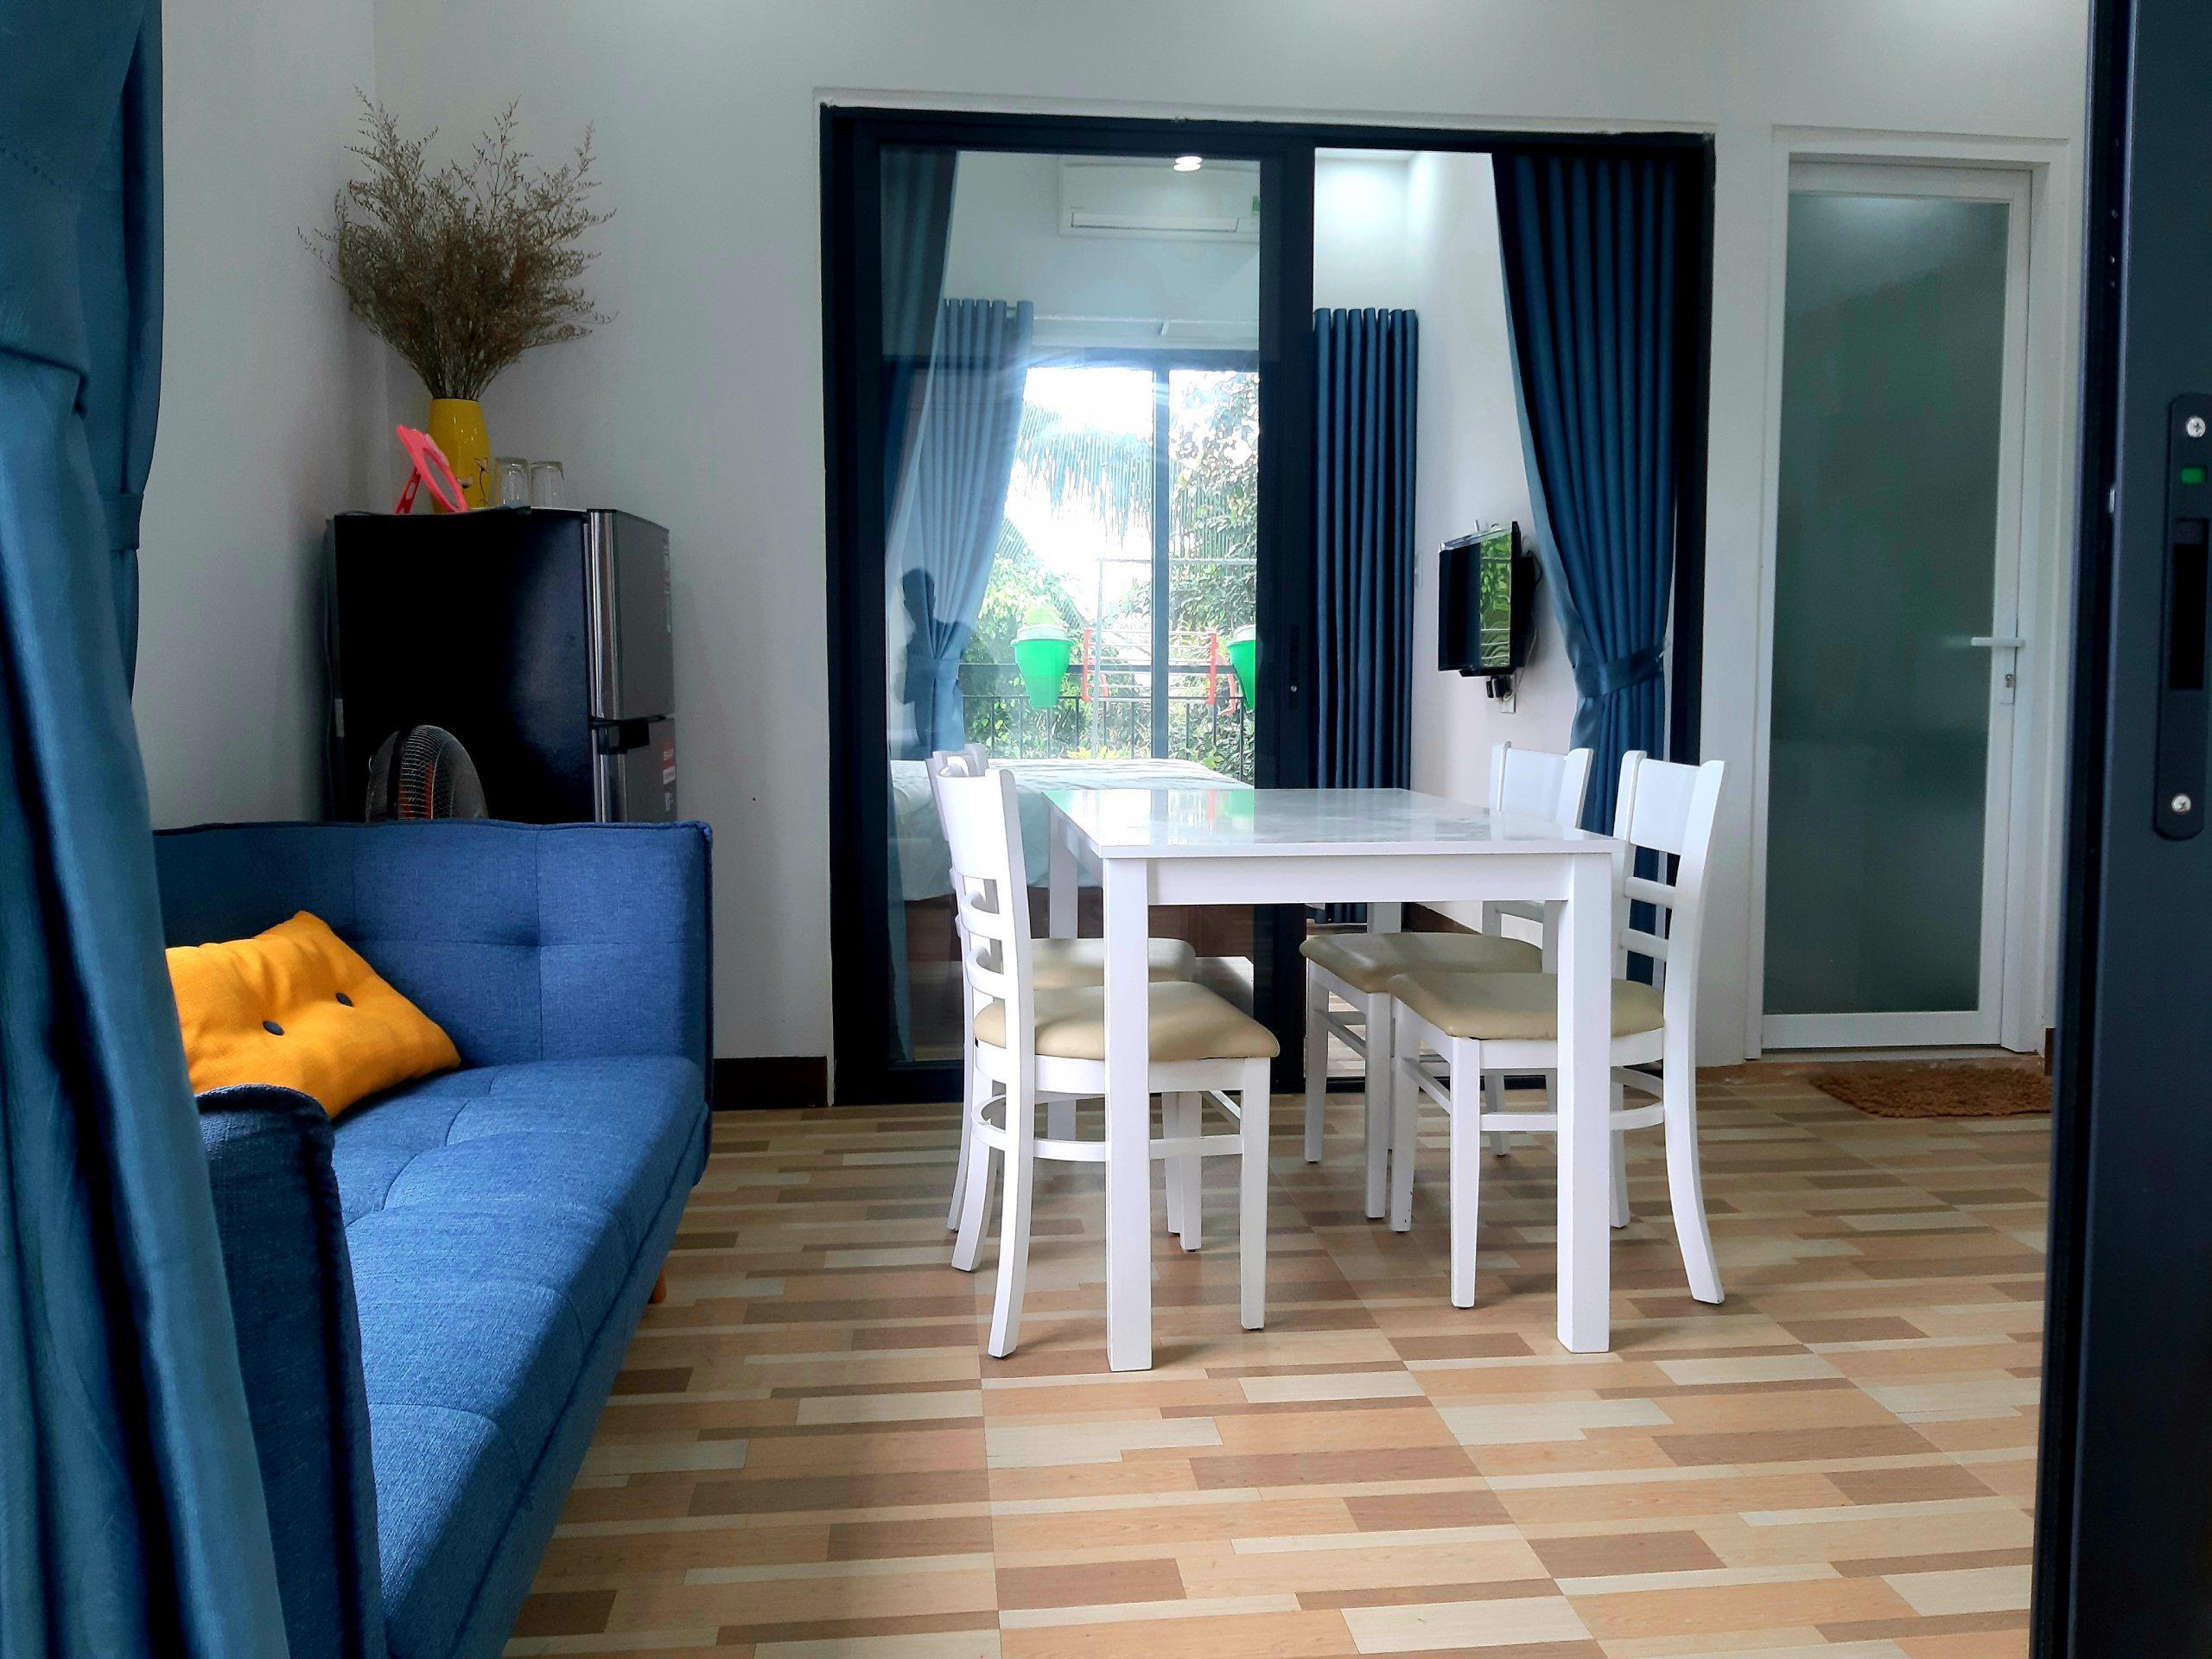 2 bedrooms apartment for rent close to beach Da Nang